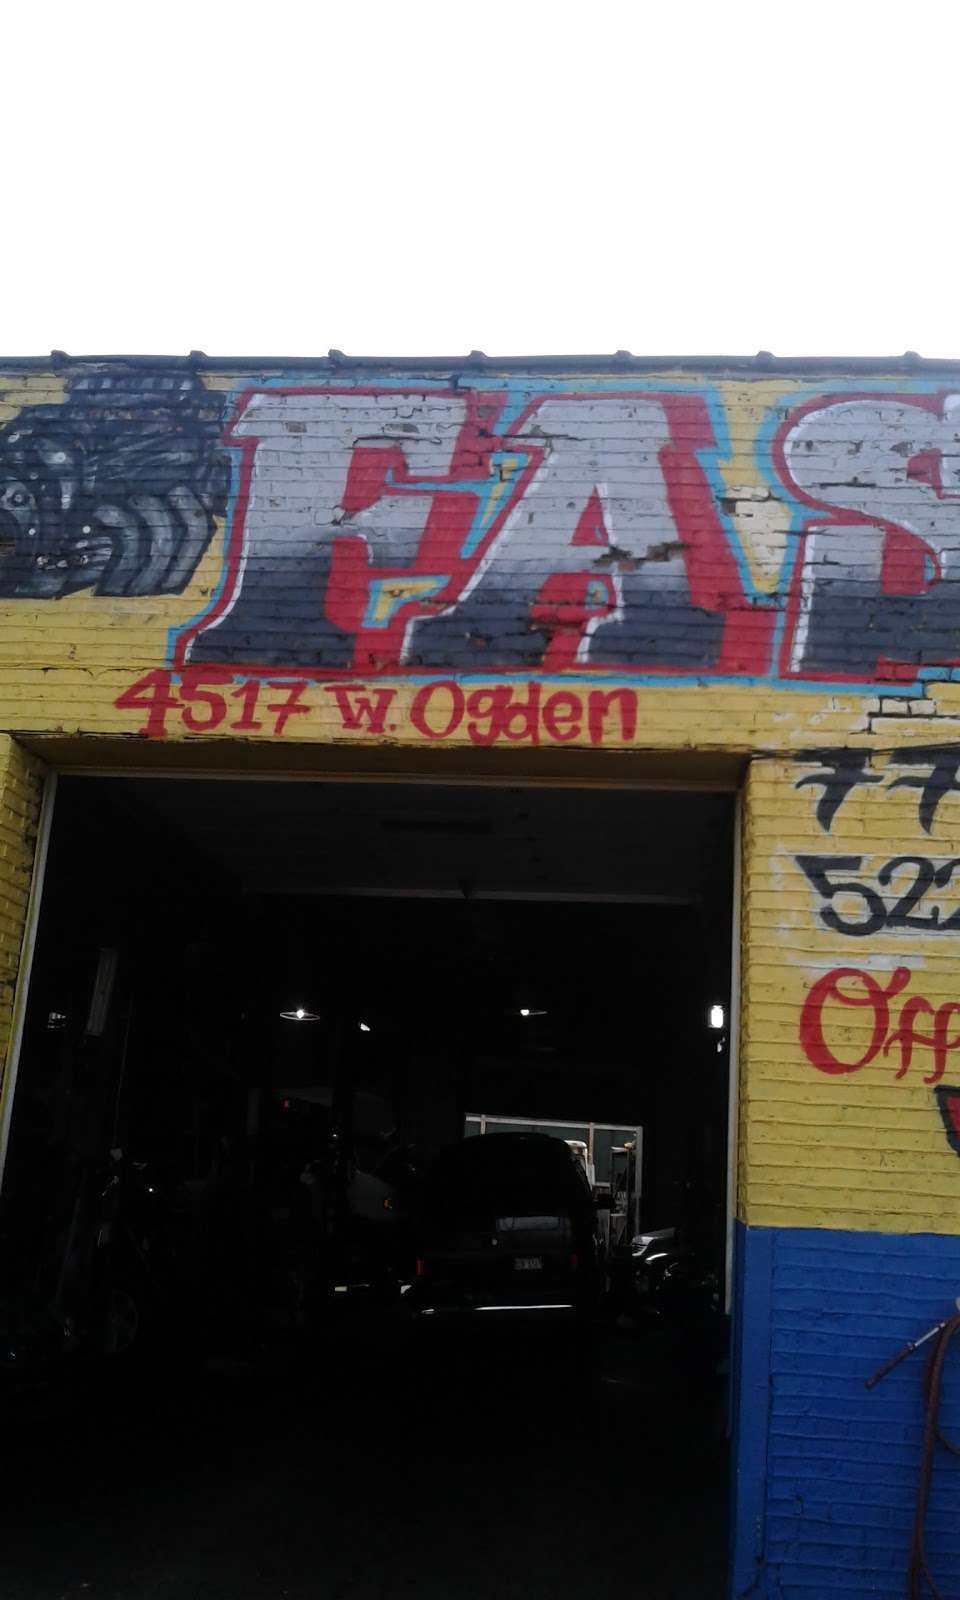 Fas Auto Repair - car repair  | Photo 7 of 7 | Address: 4517 Ogden Ave, Chicago, IL 60623, USA | Phone: (773) 522-2444